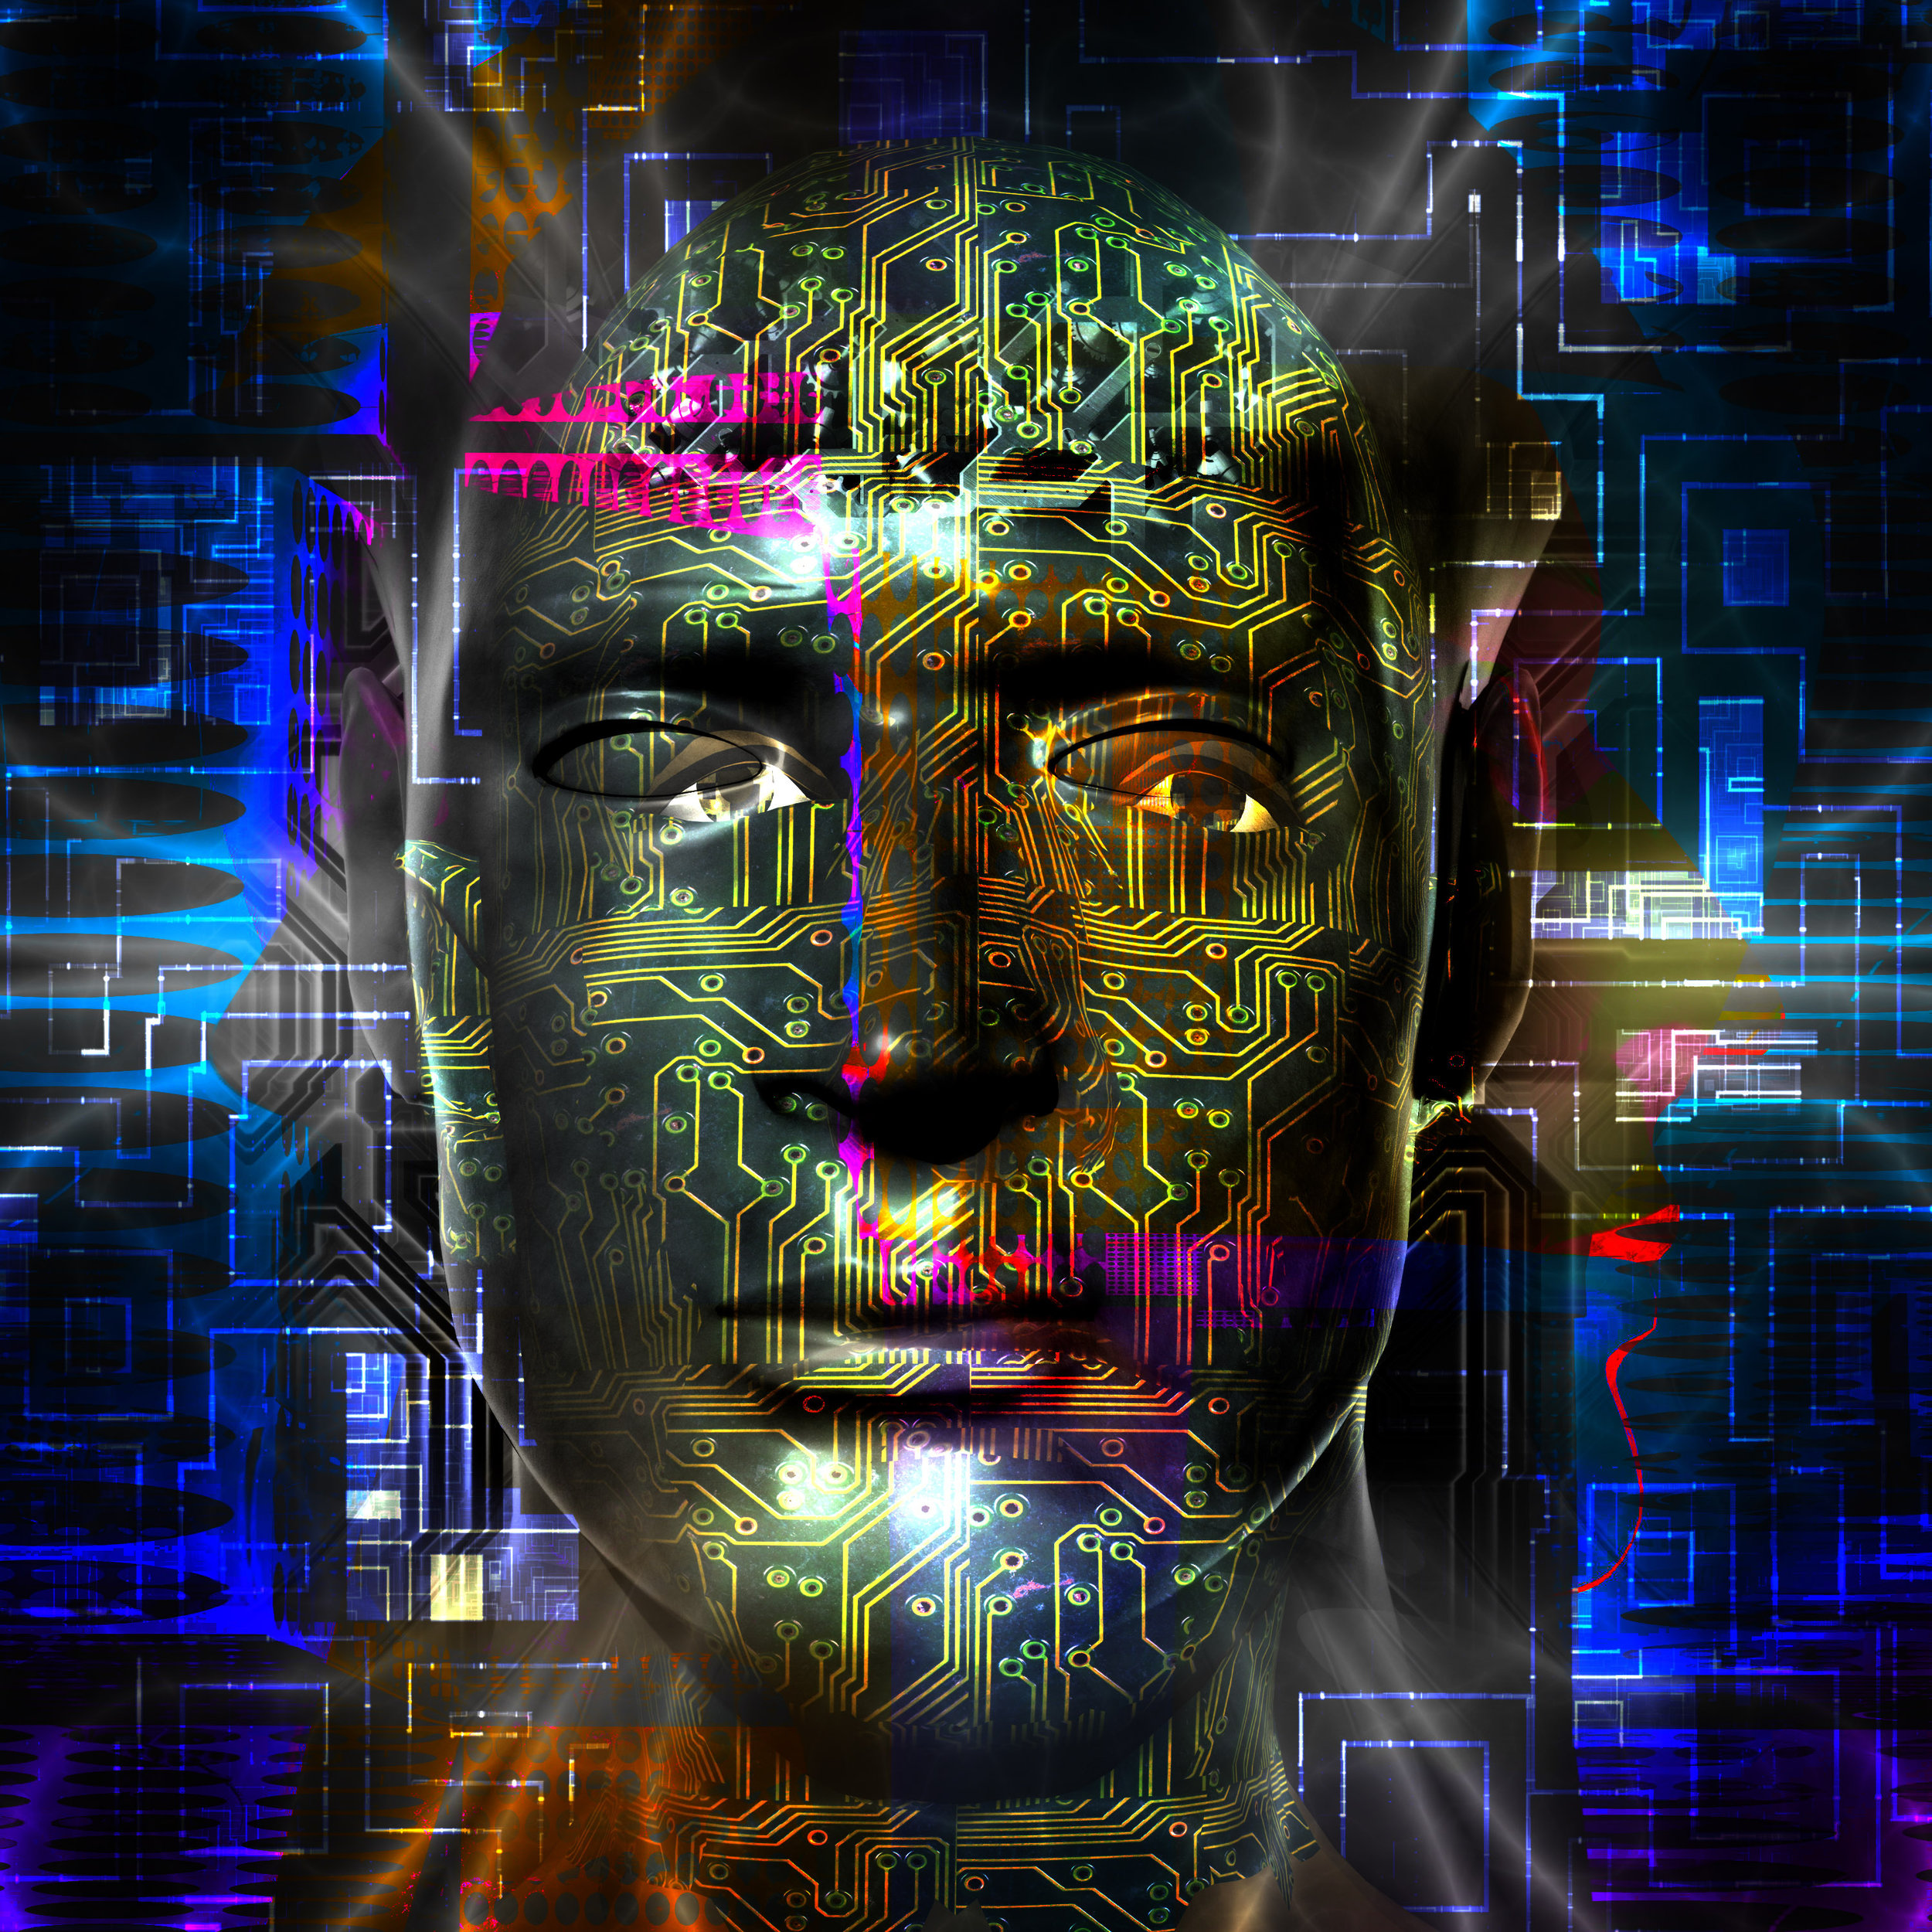 Cyborgs will rule Earth in the near future.